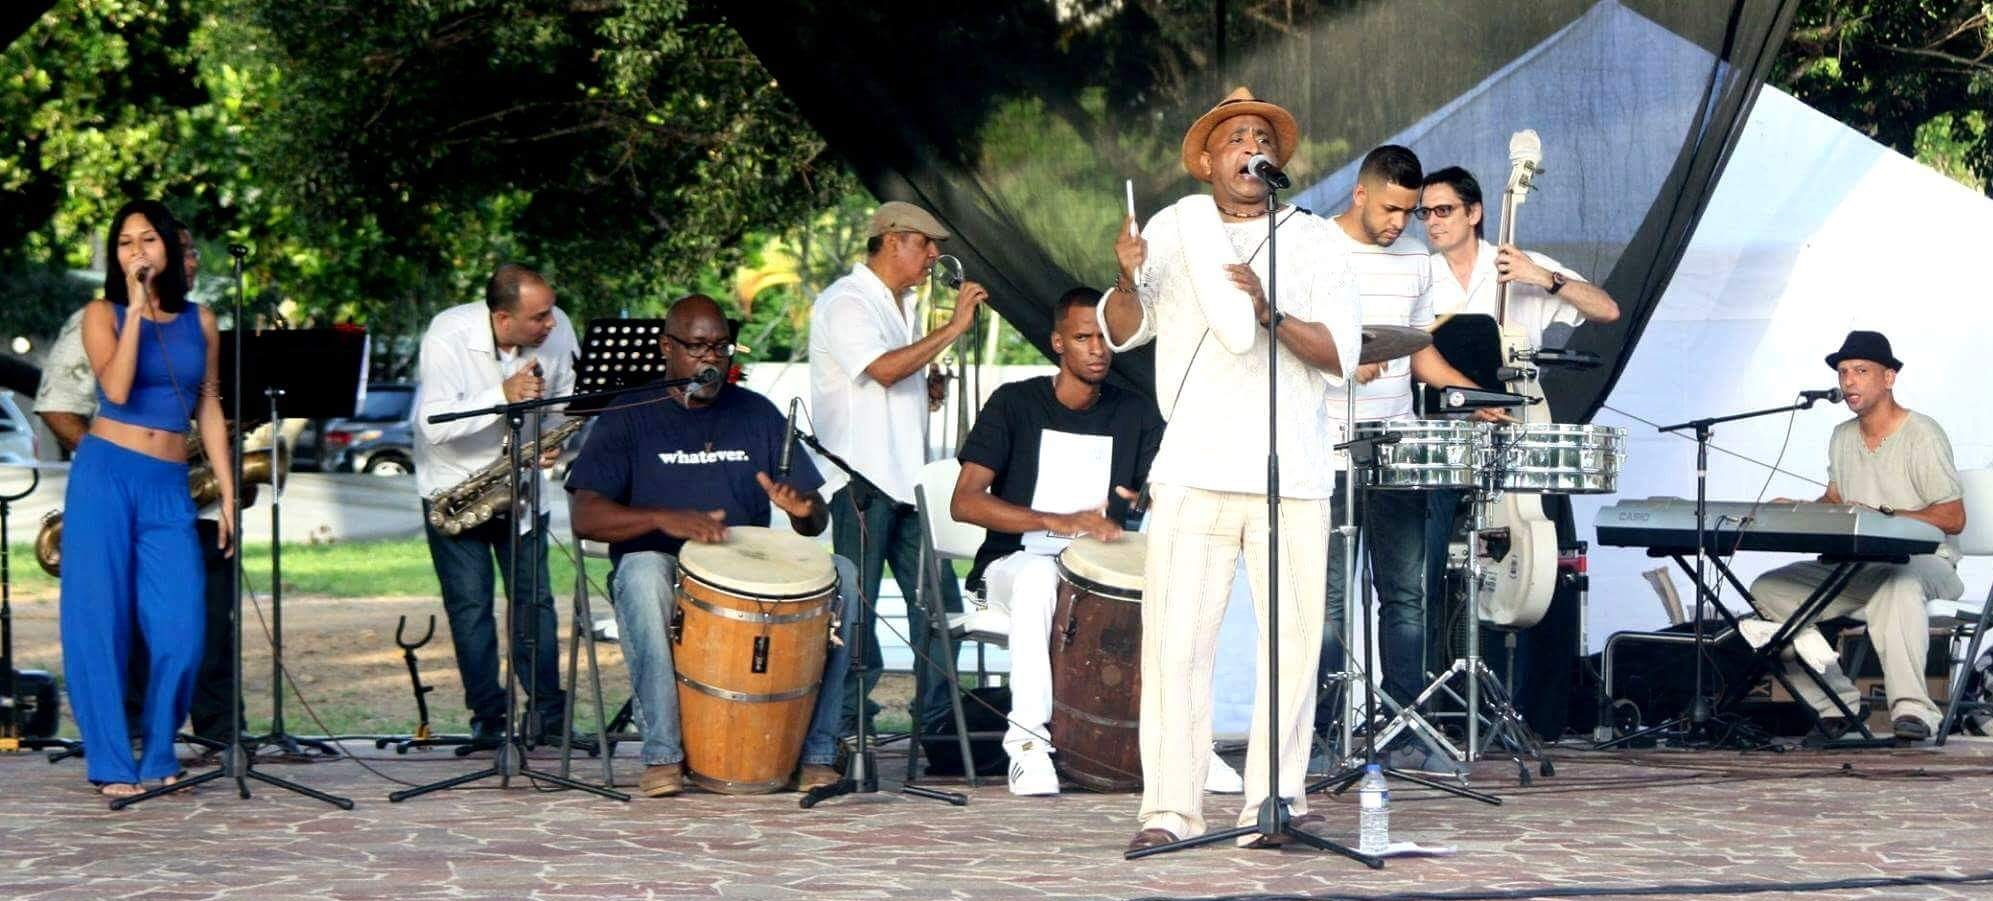 Tambores Calientes se originó en Loíza, inspirados por la obra de Cortijo e Ismael. (Foto suministrada)